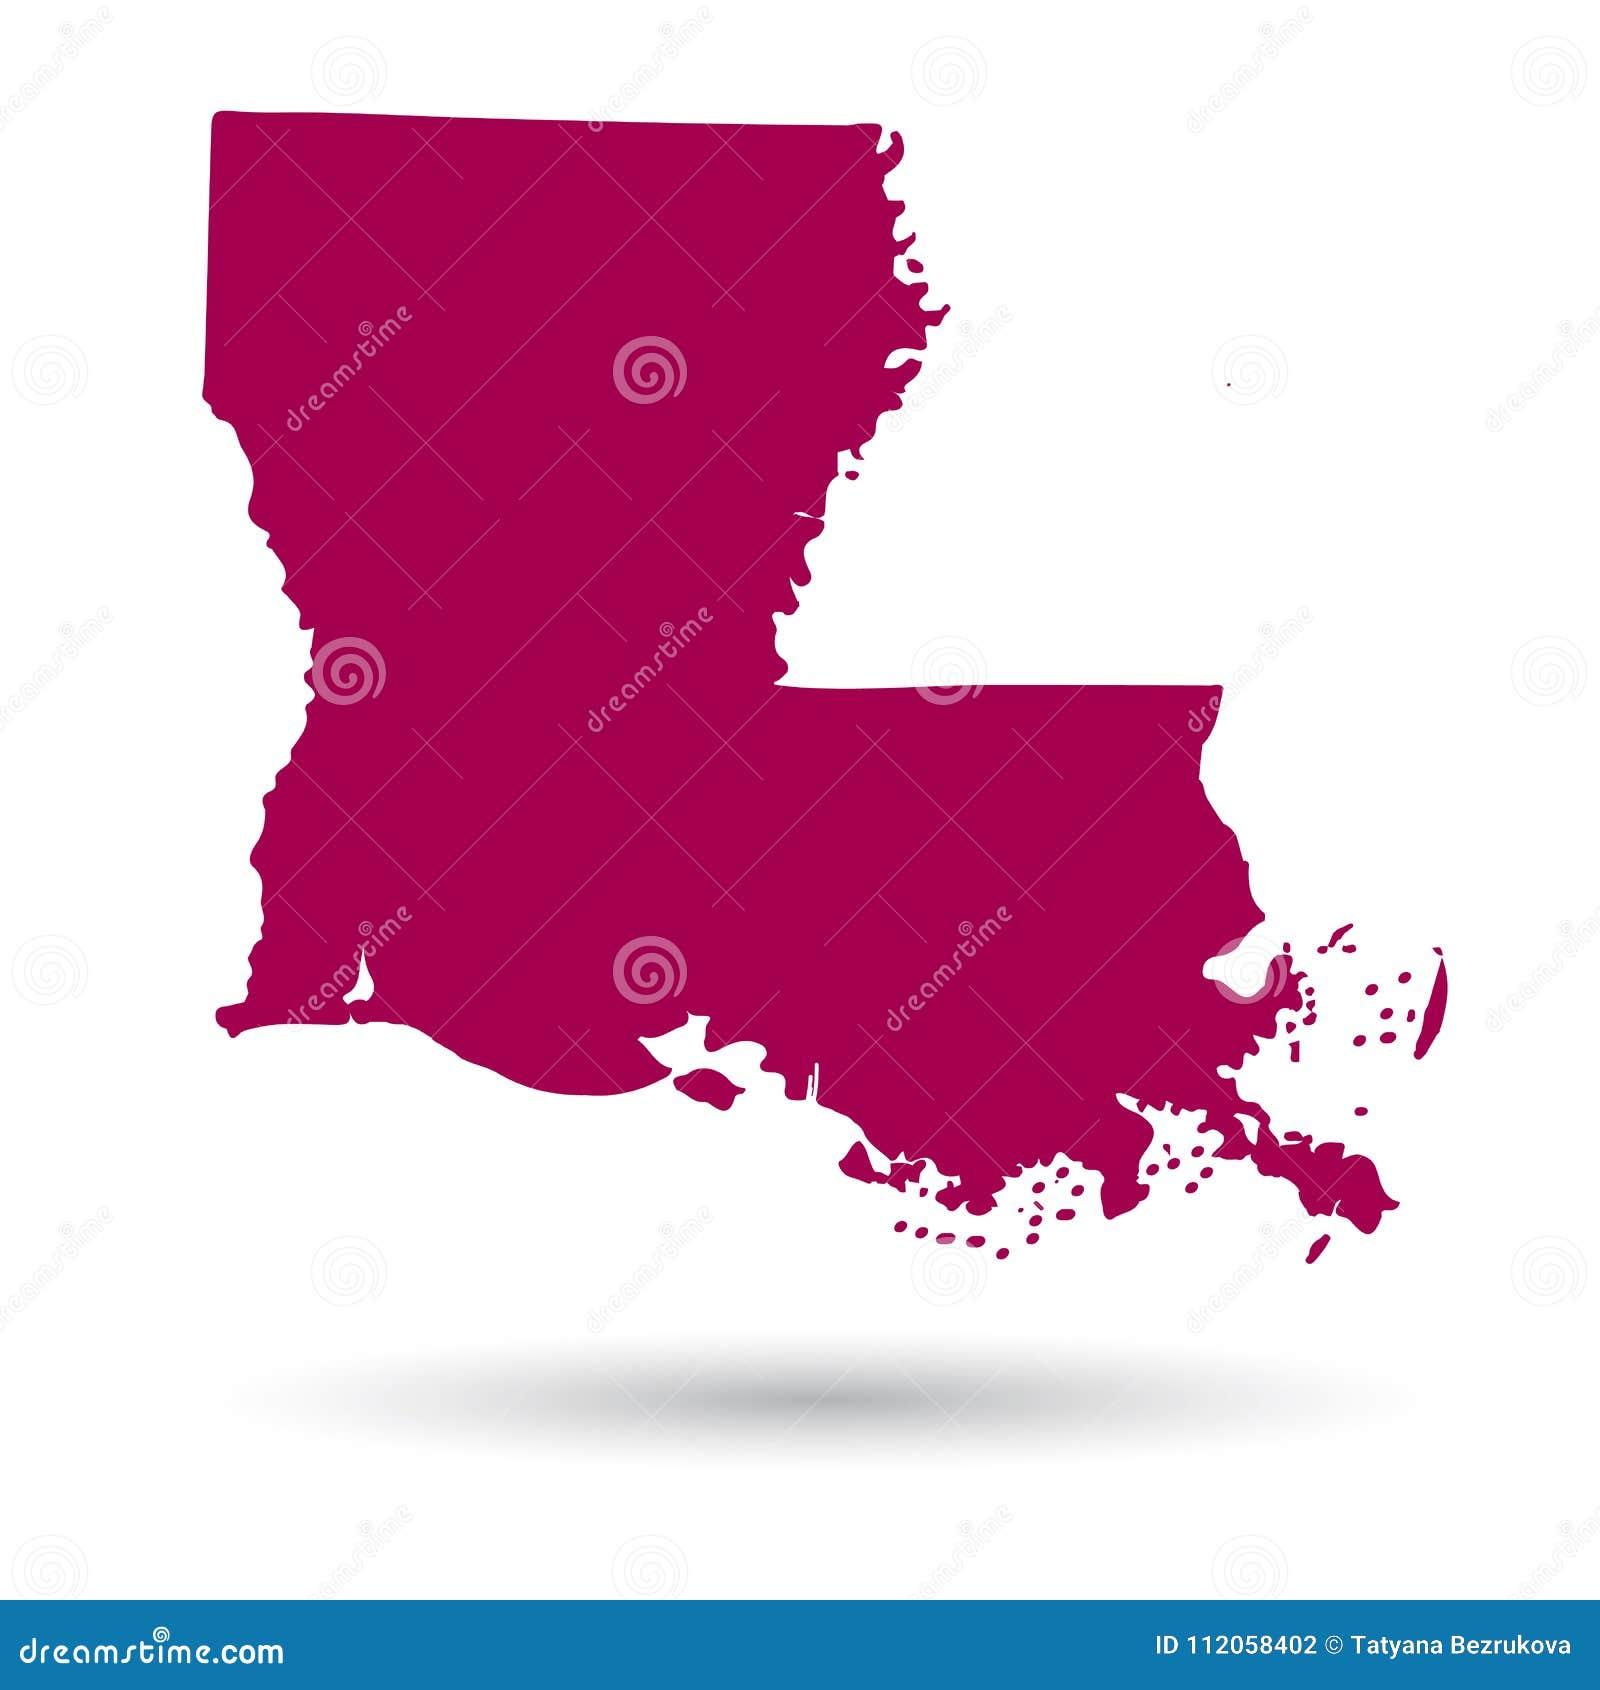 S In Louisiana Map on